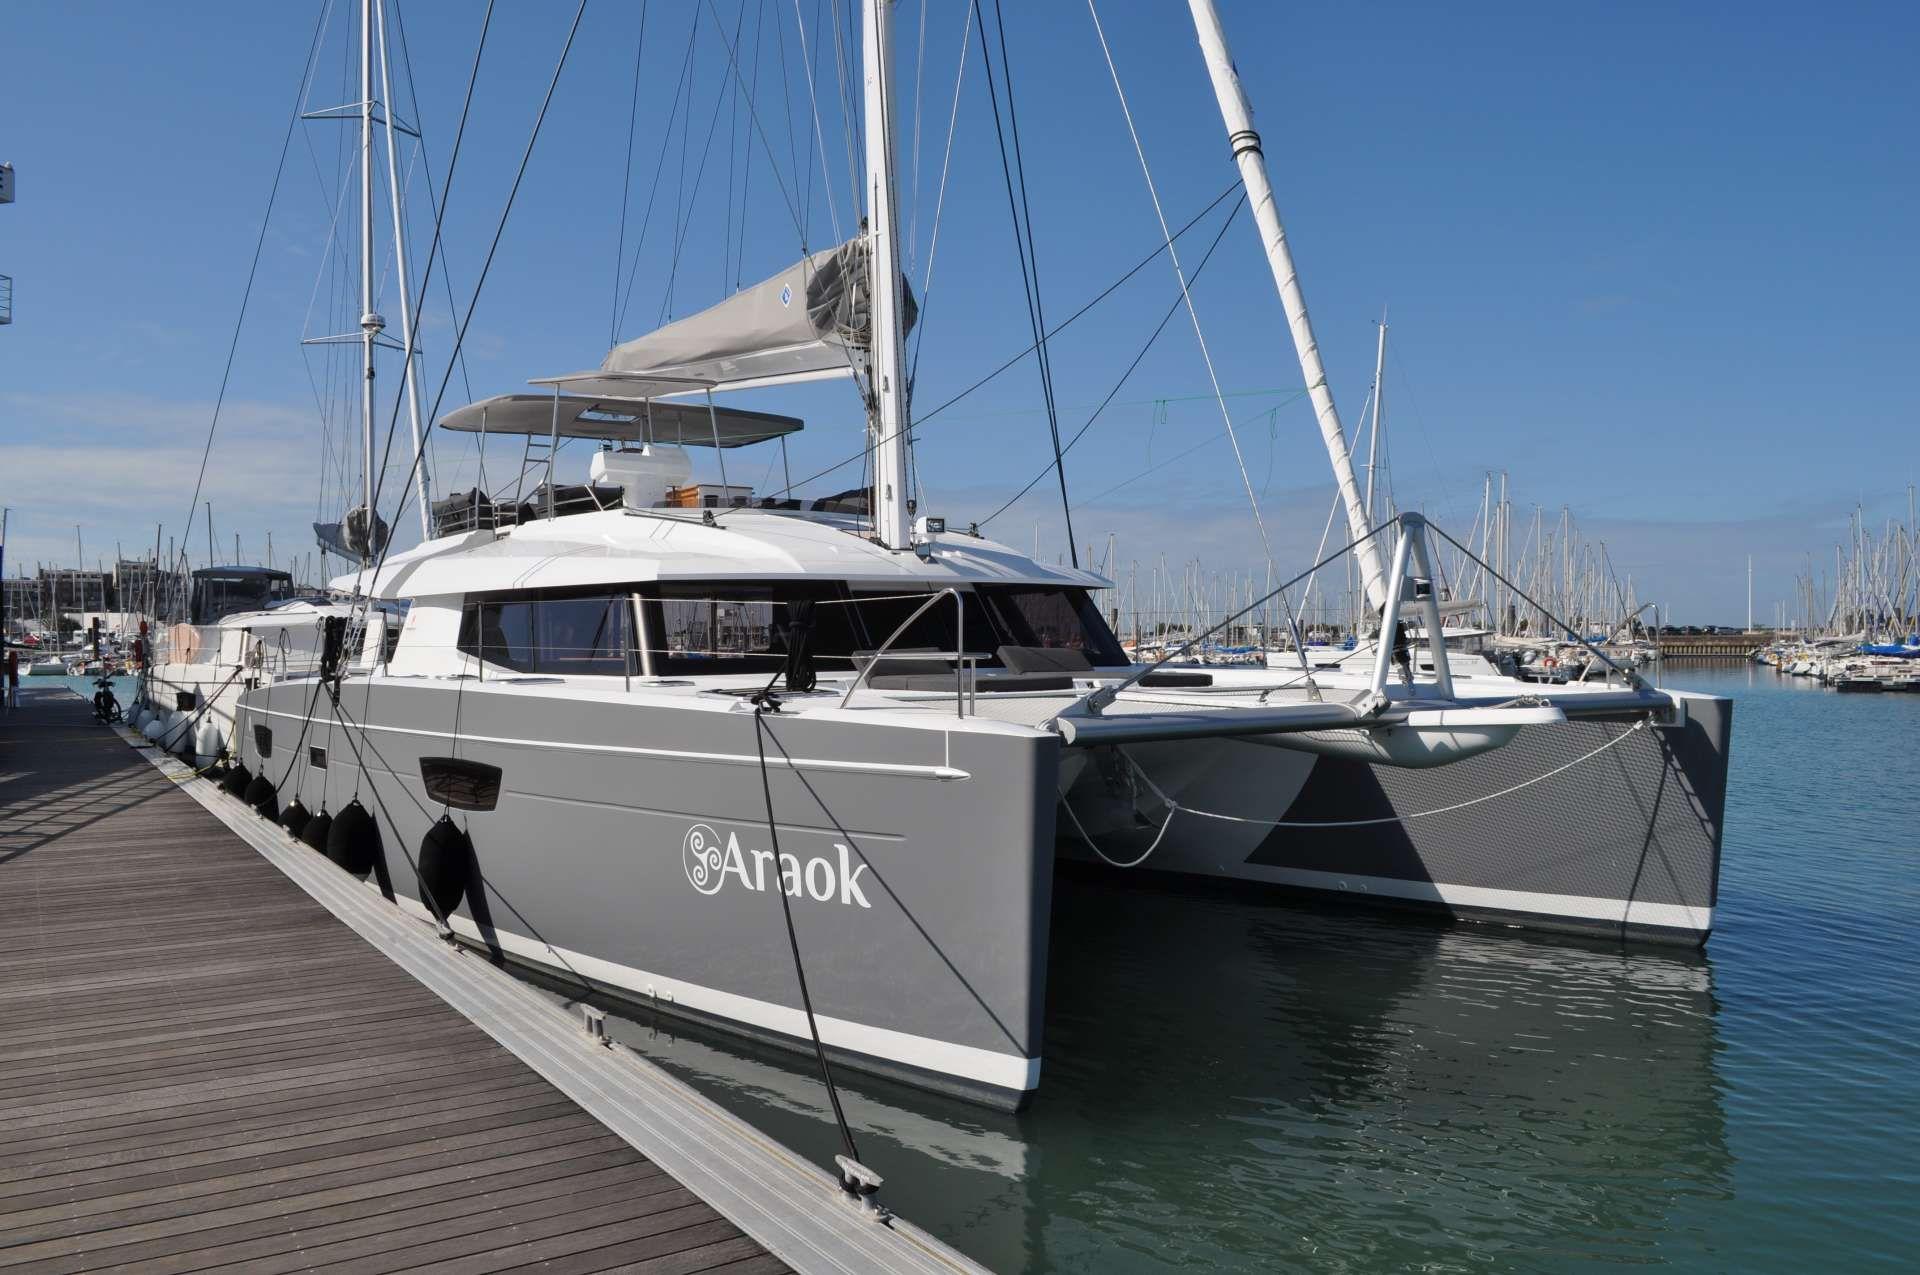 ARAOK - Fountaine Pajot Ipanema 58 - 3 Cabins - Cannes - Monaco - St Tropez - Bonifacio - Porto Cervo - Tortola: